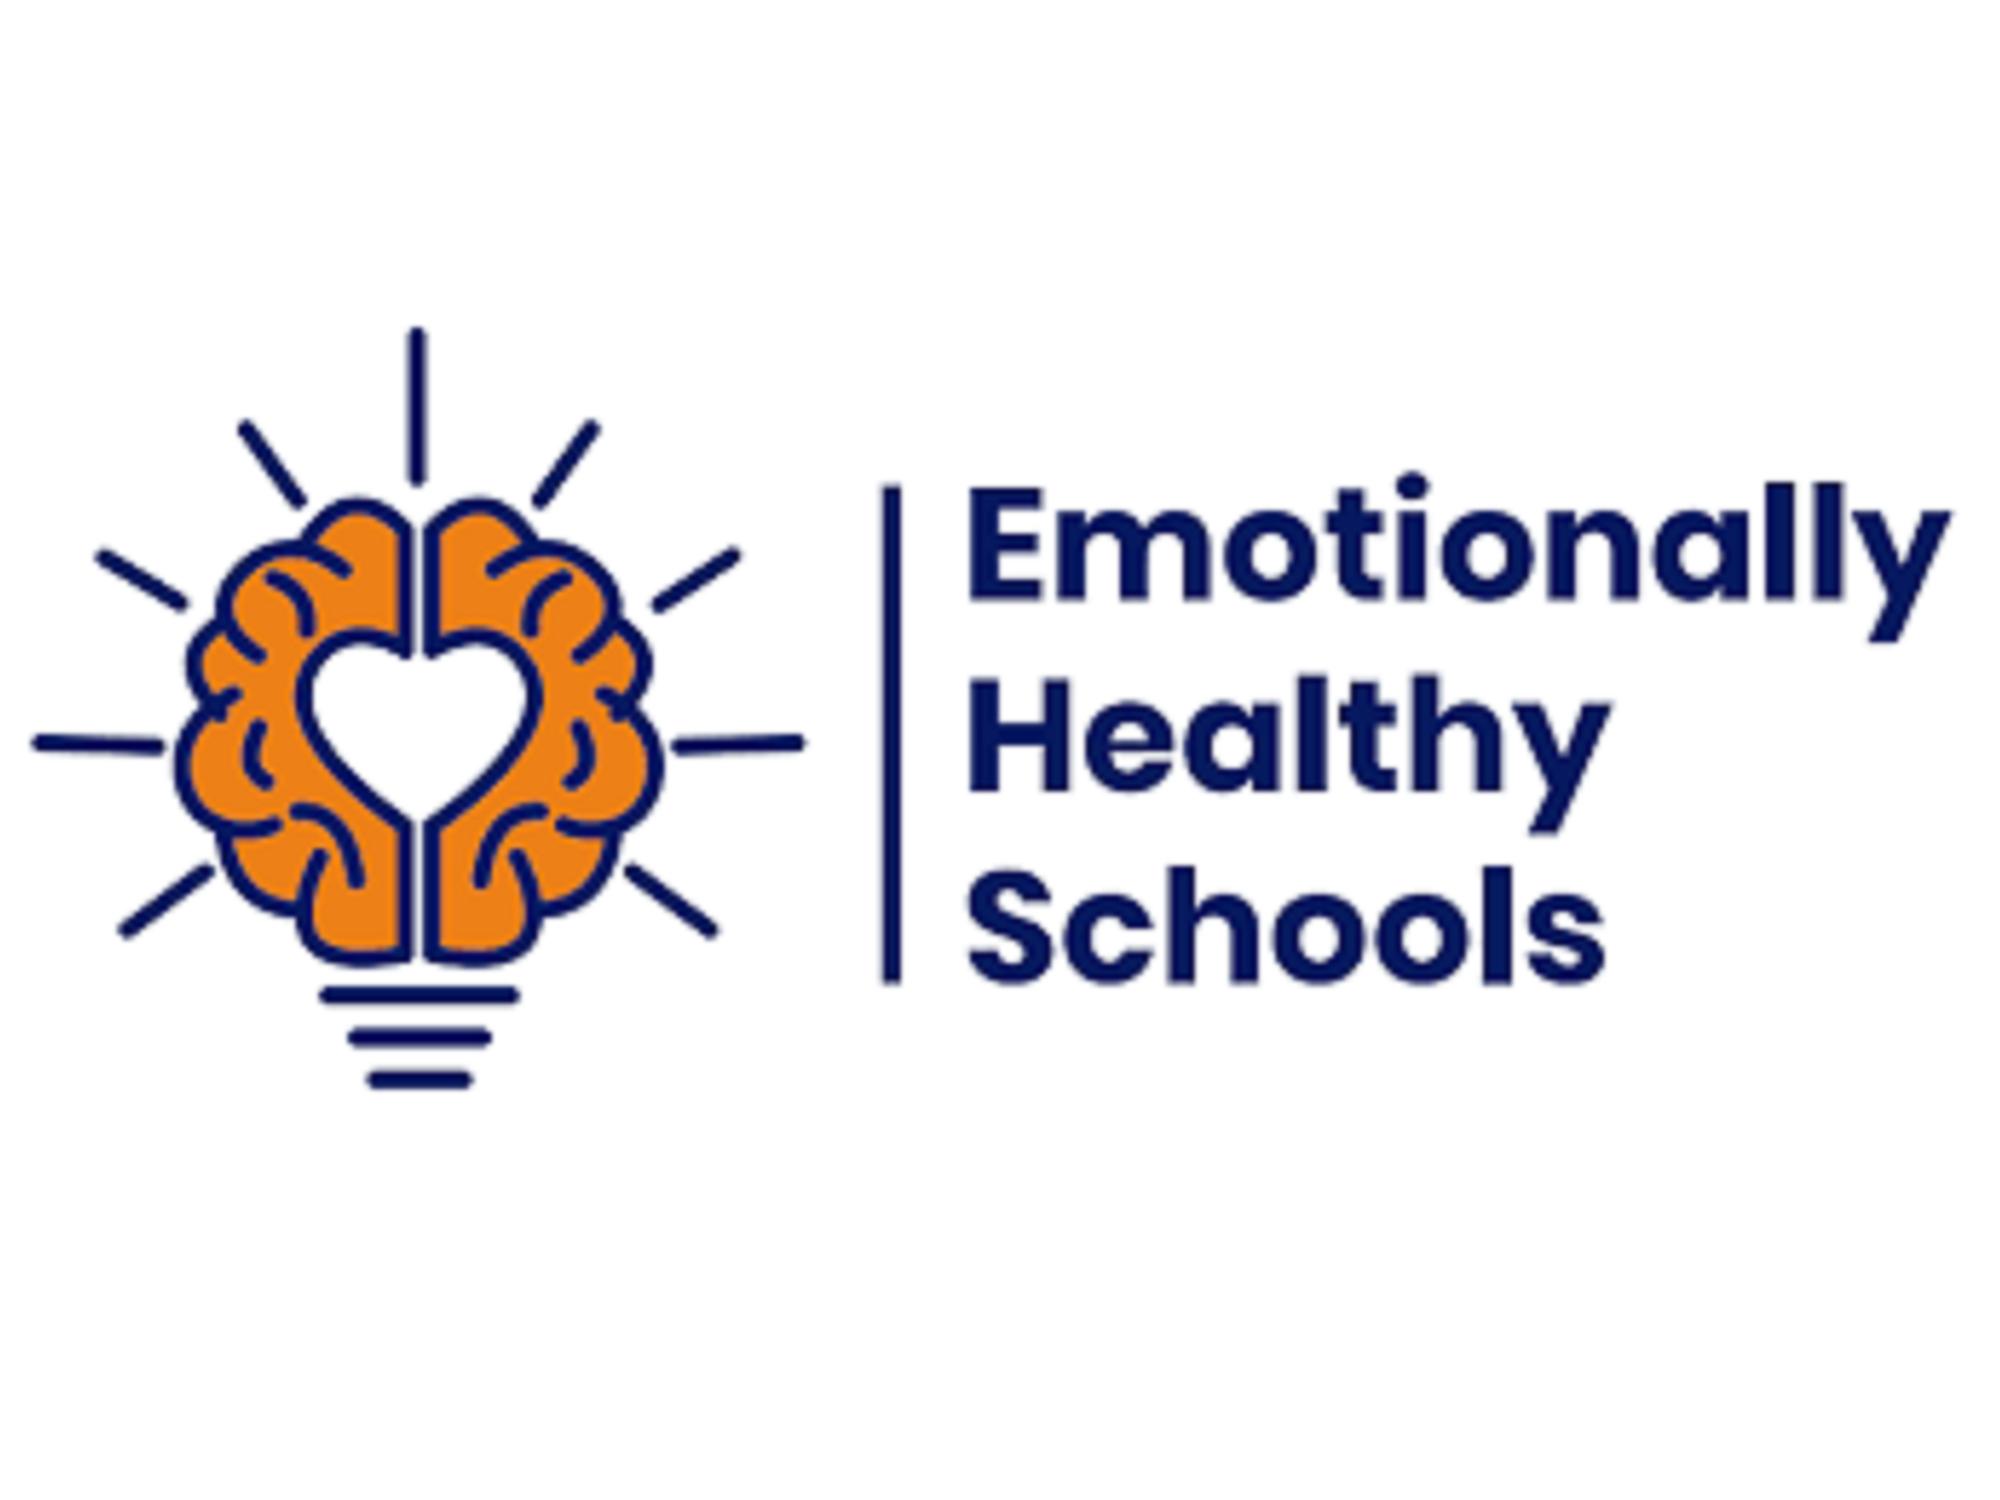 Emotionally Healthy Schools Programme logo